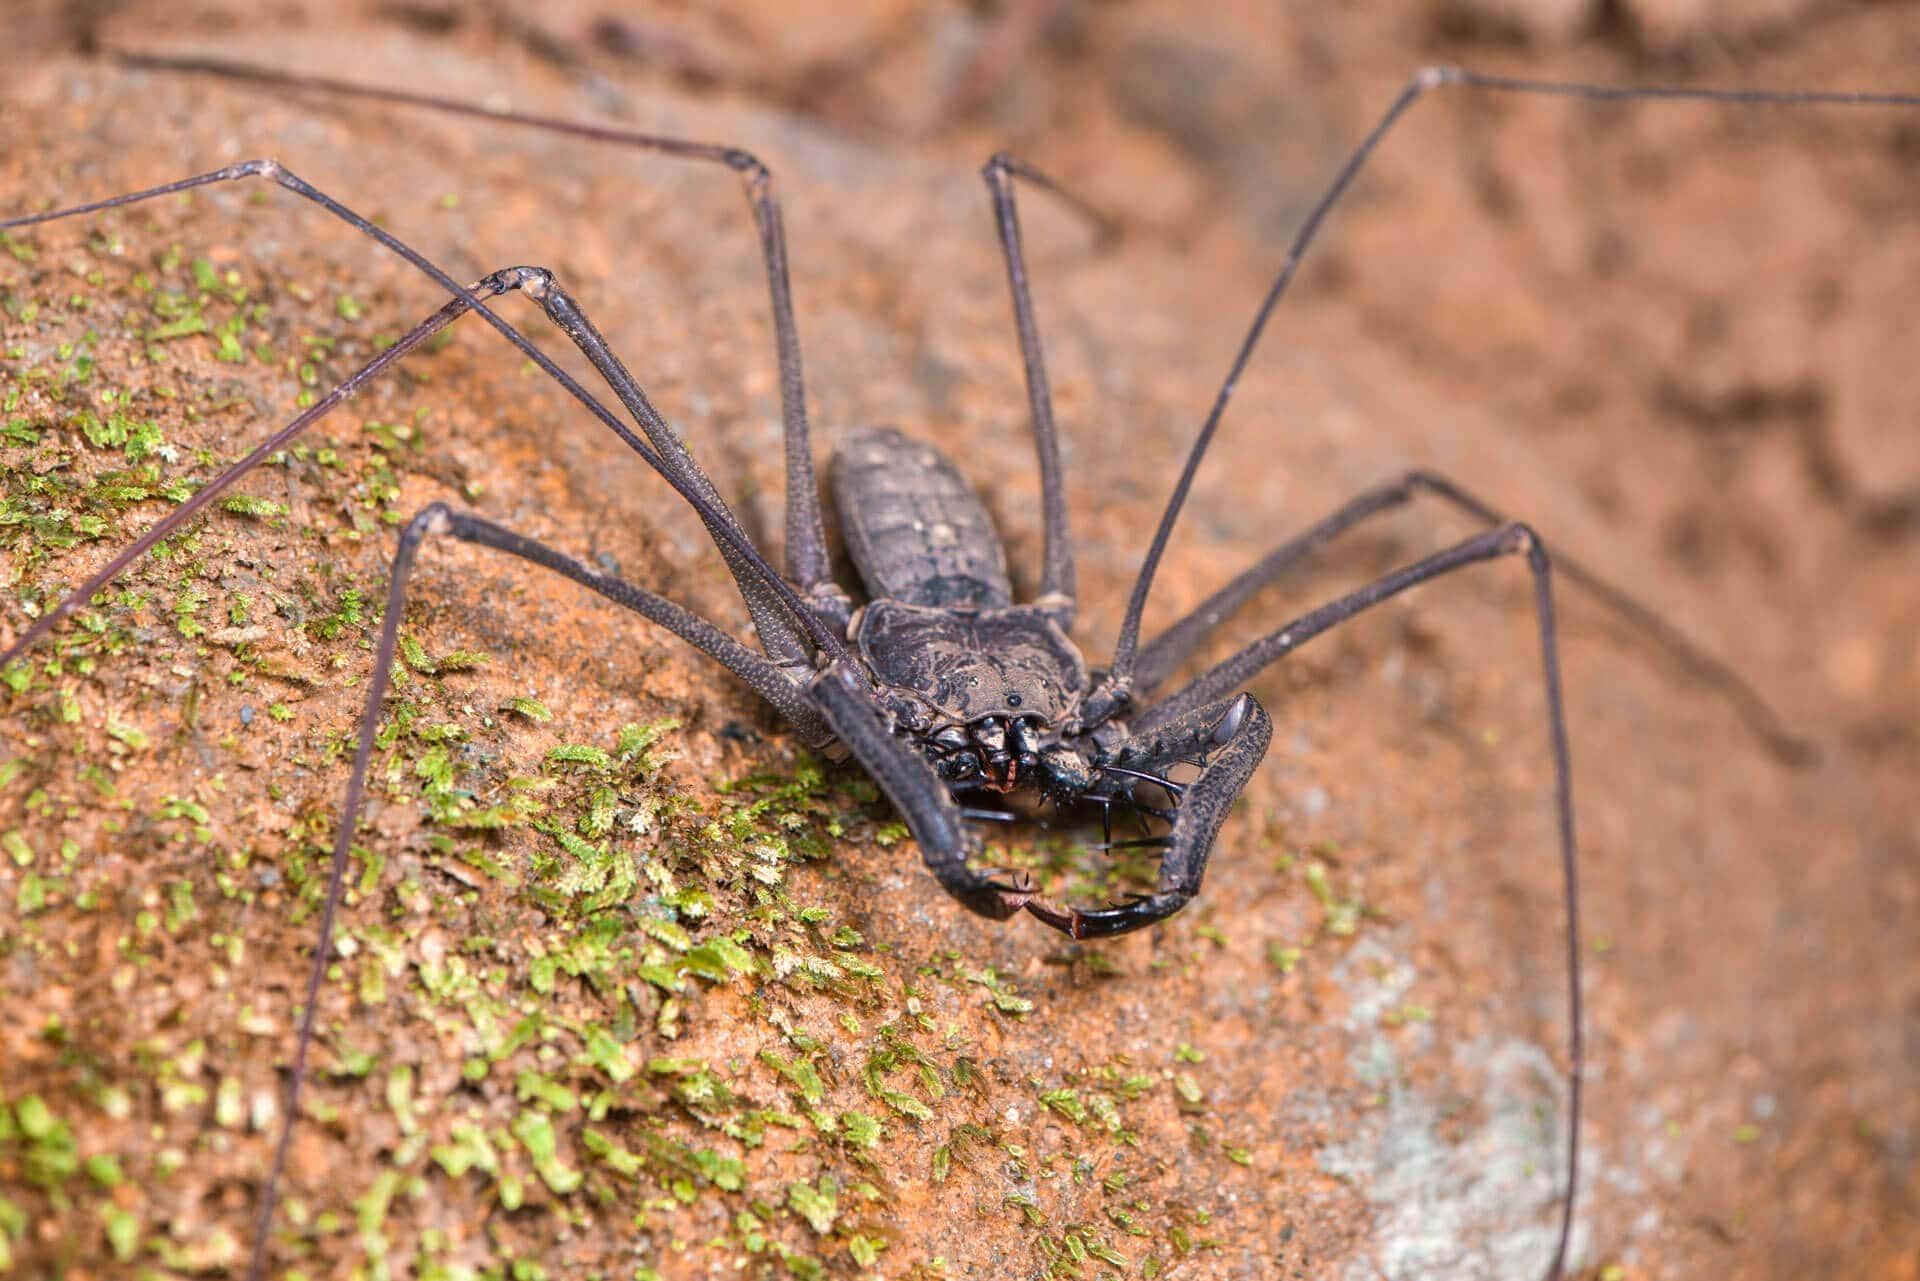 Invertebrates of the jungle: not so creepy crawlies - Crees Manu